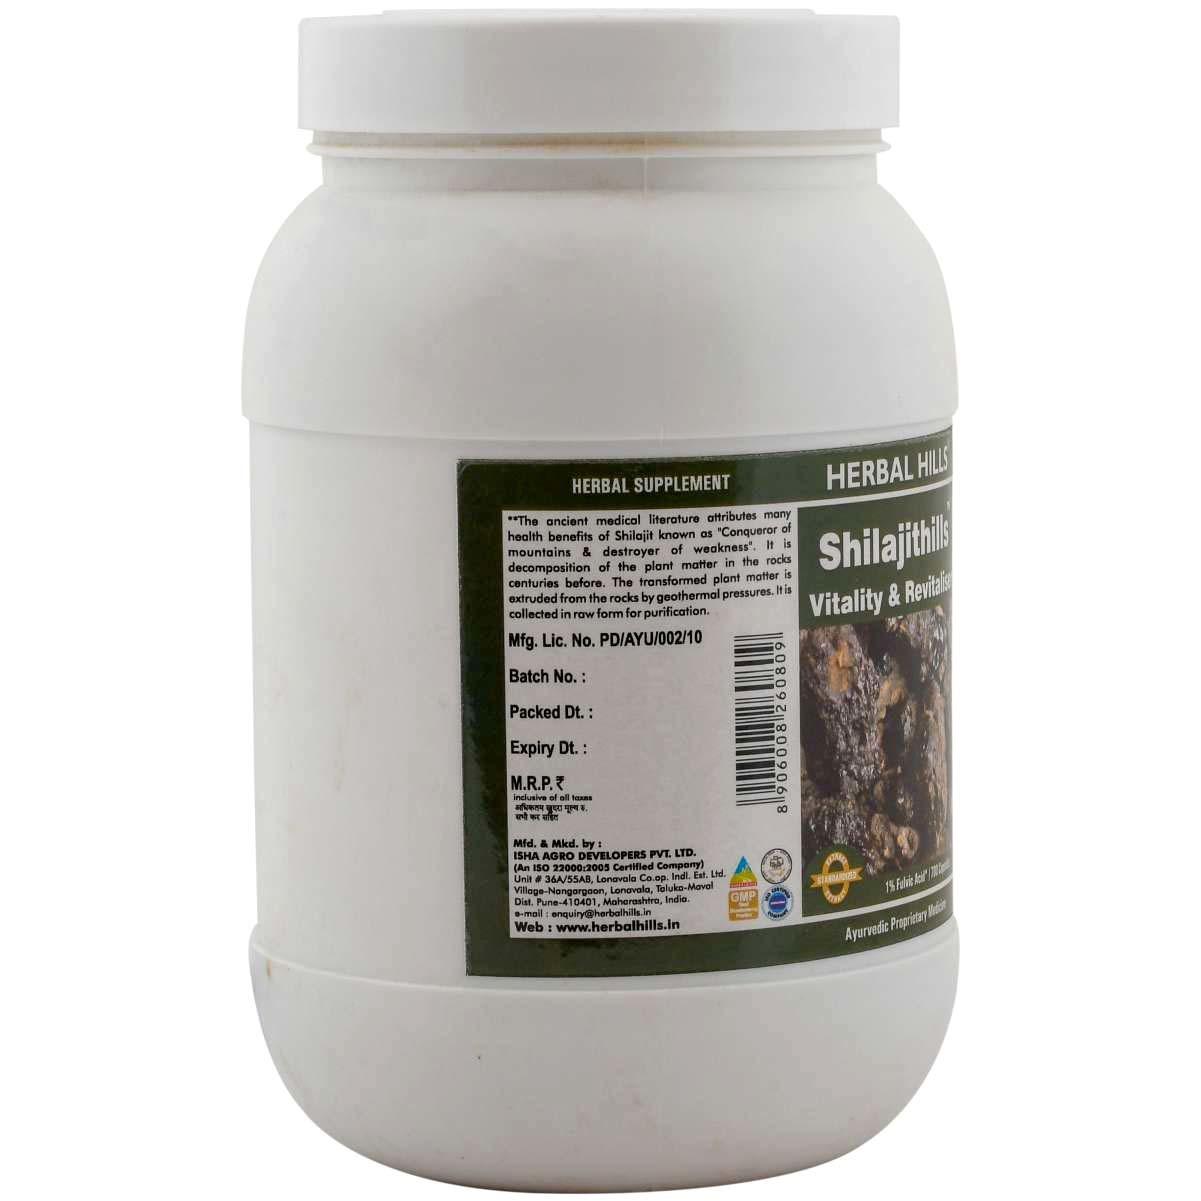 Ayurvedic Medicines for Strength and Stamina - Shilajit 700 Capsule